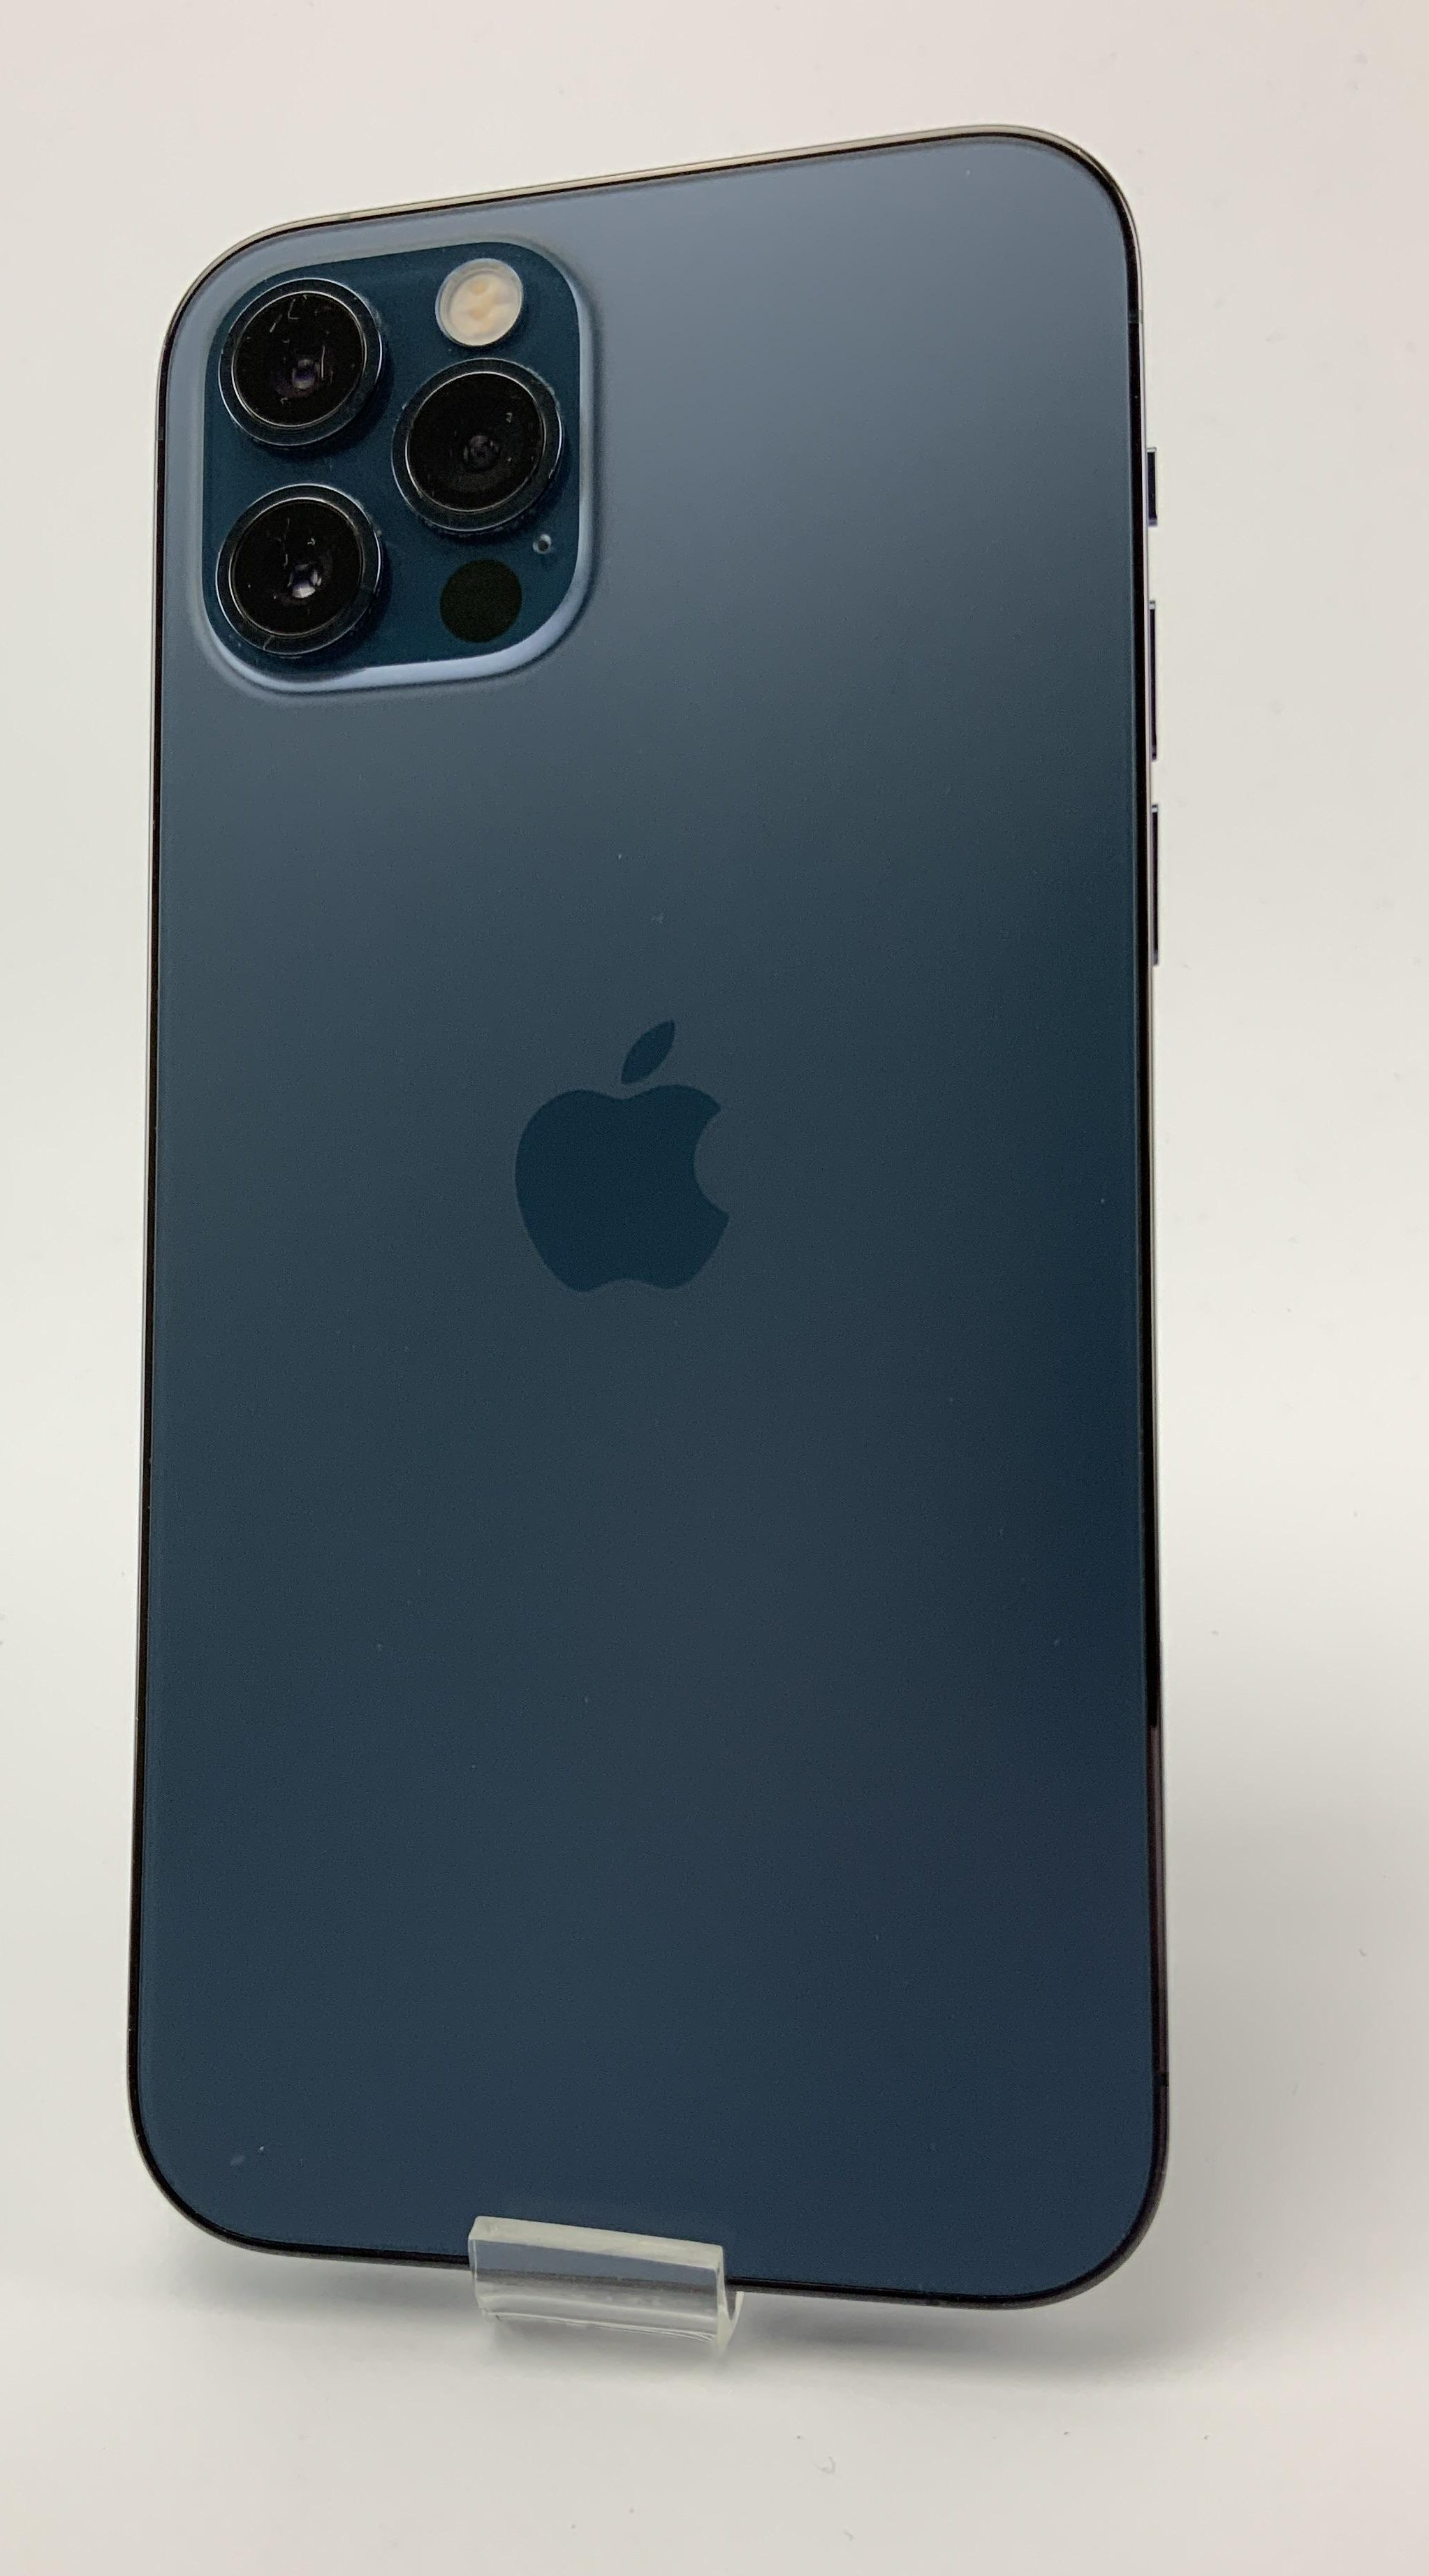 iPhone 12 Pro 256GB, 256GB, Pacific Blue, Afbeelding 2